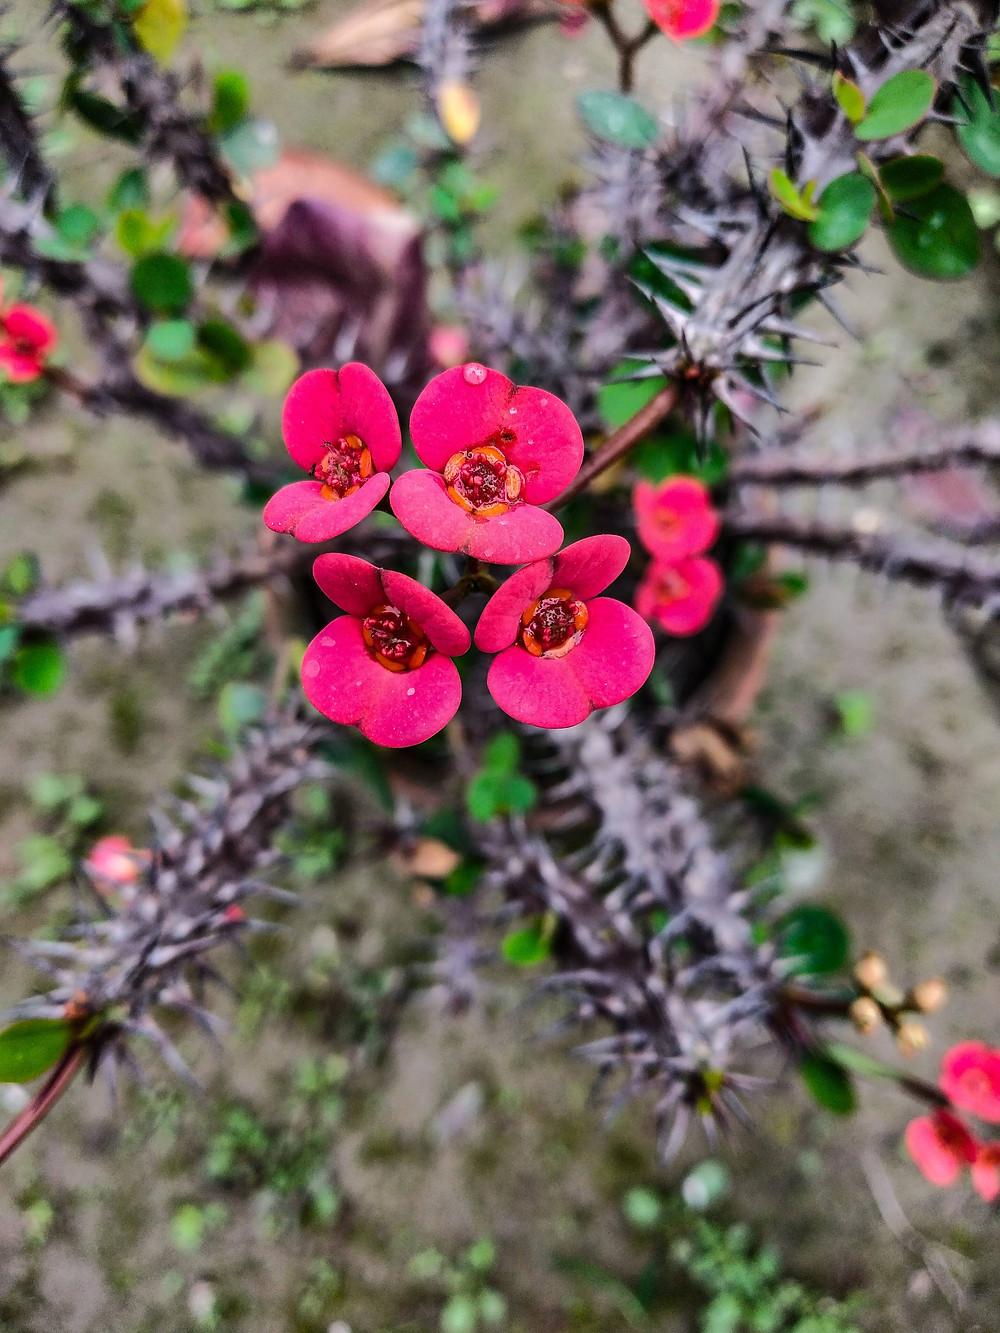 Flower in thorns